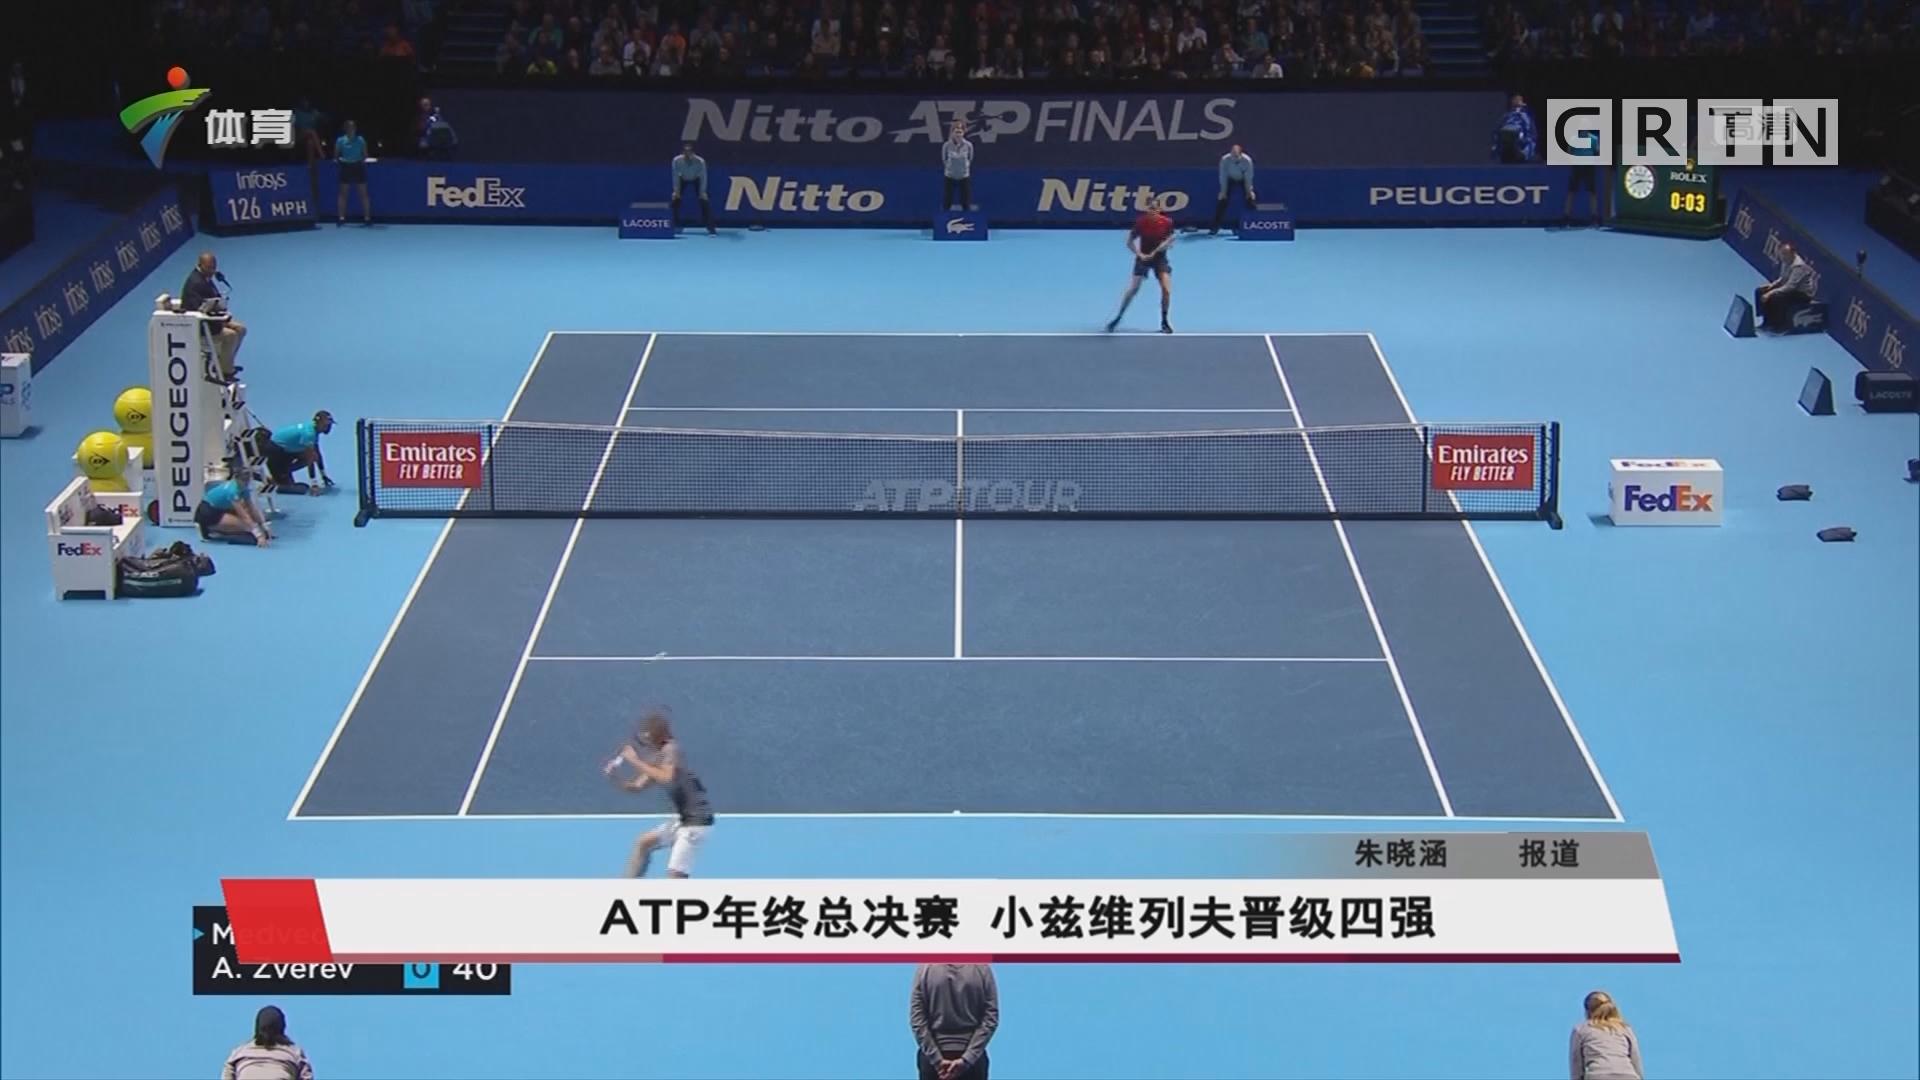 ATP年终总决赛 小兹维列夫晋级四强